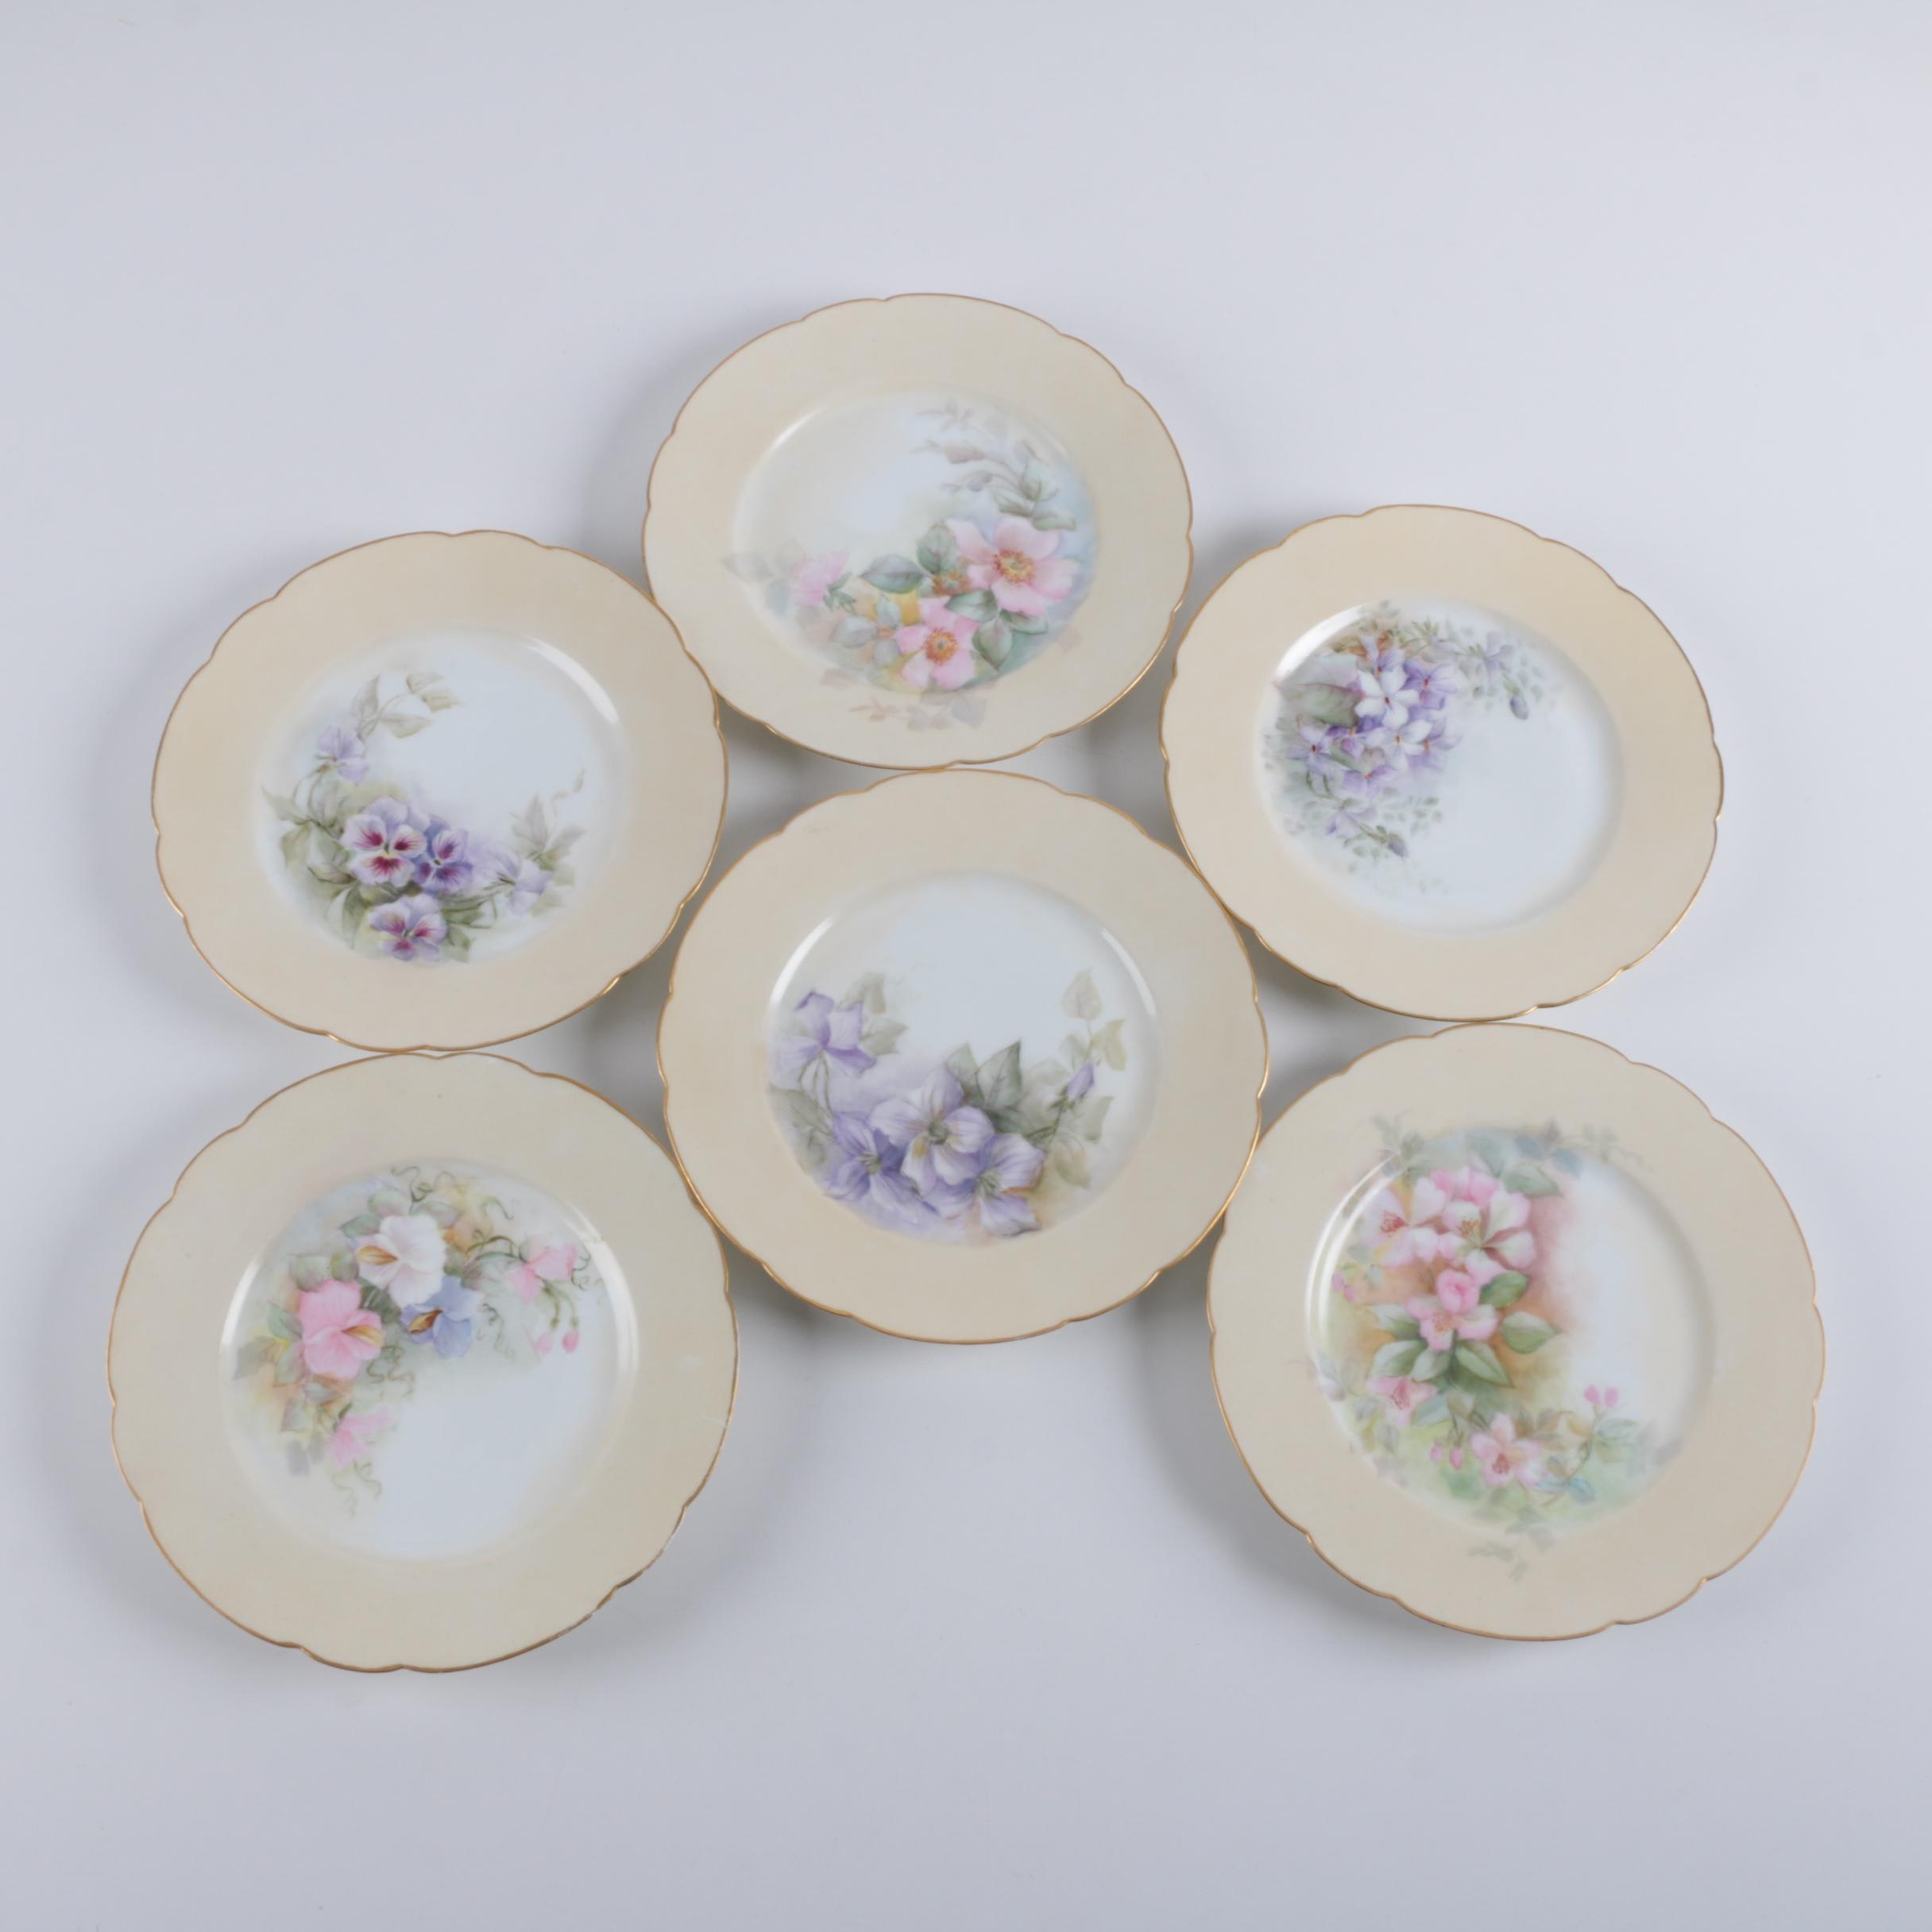 Hand Painted Haviland Limoges Porcelain Plates